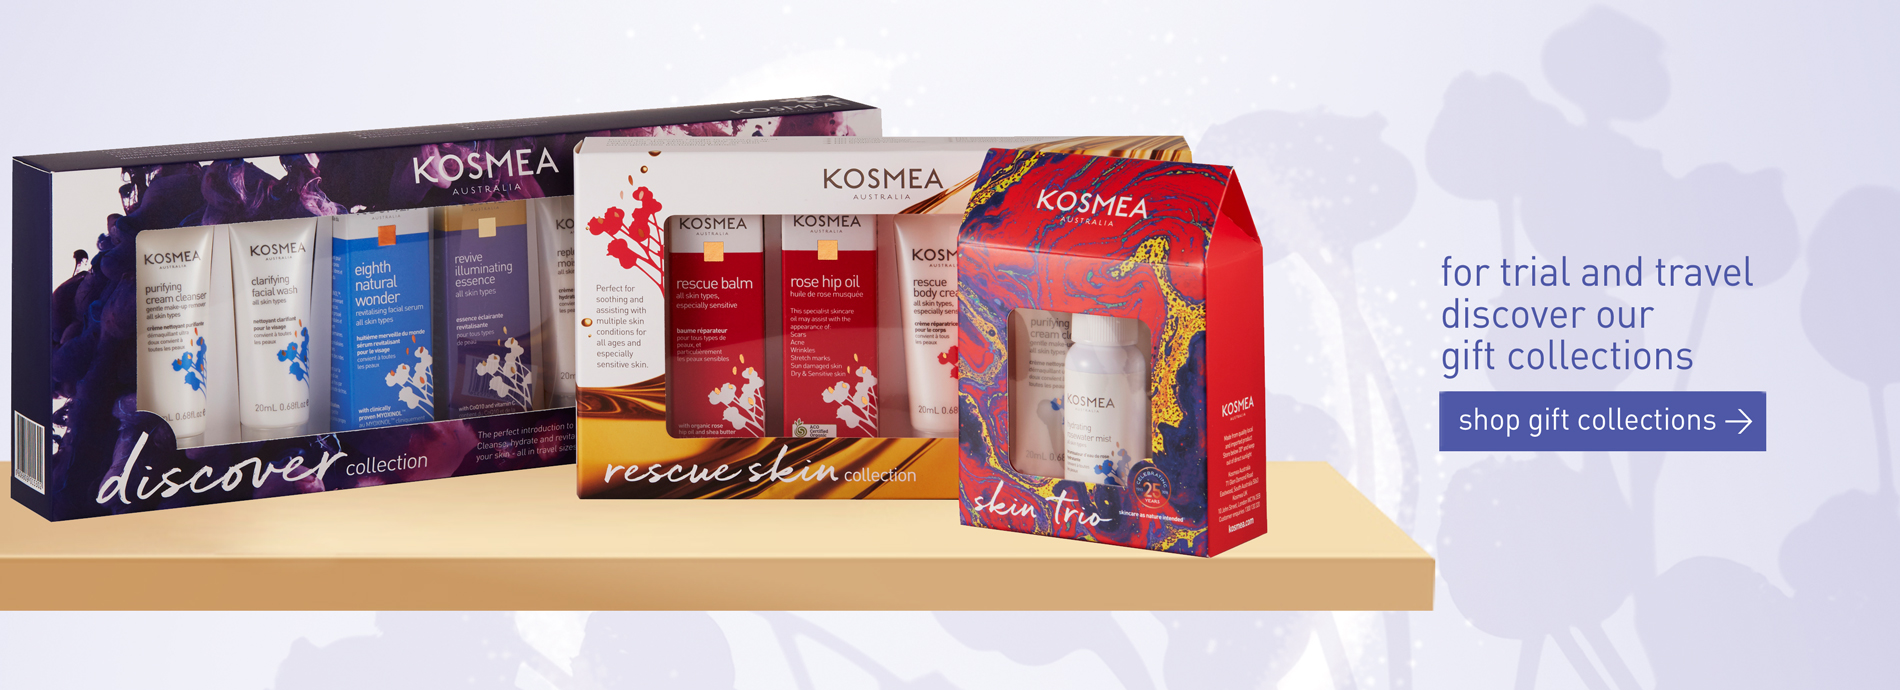 Best Natural Skin Care Products   Organic Skin Care Expert   Kosmea